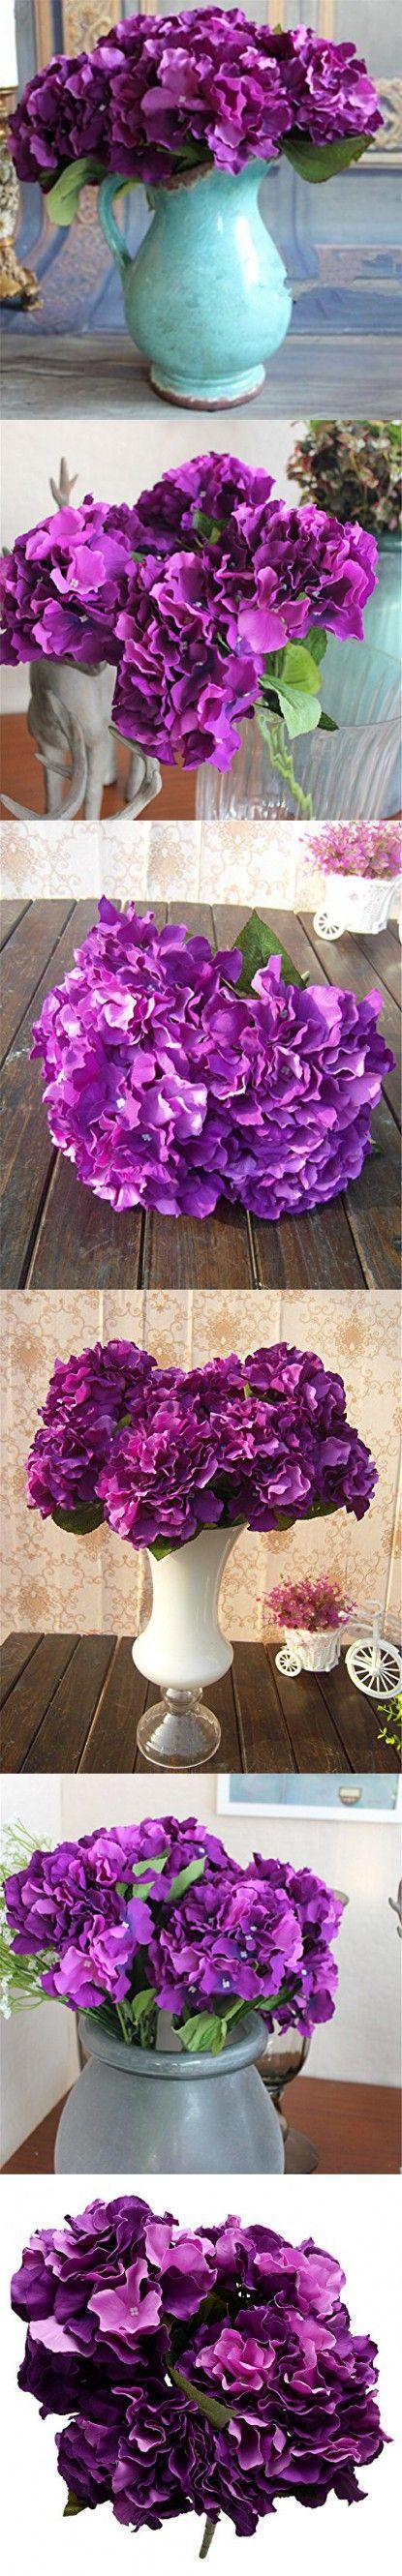 Derker Silk Artificial Hydrangea Bouquet 5 Big Heads Hydrangea Flowers Arrangement Home Wedding Centerpieces Christmas Decoration (Dark Purple)